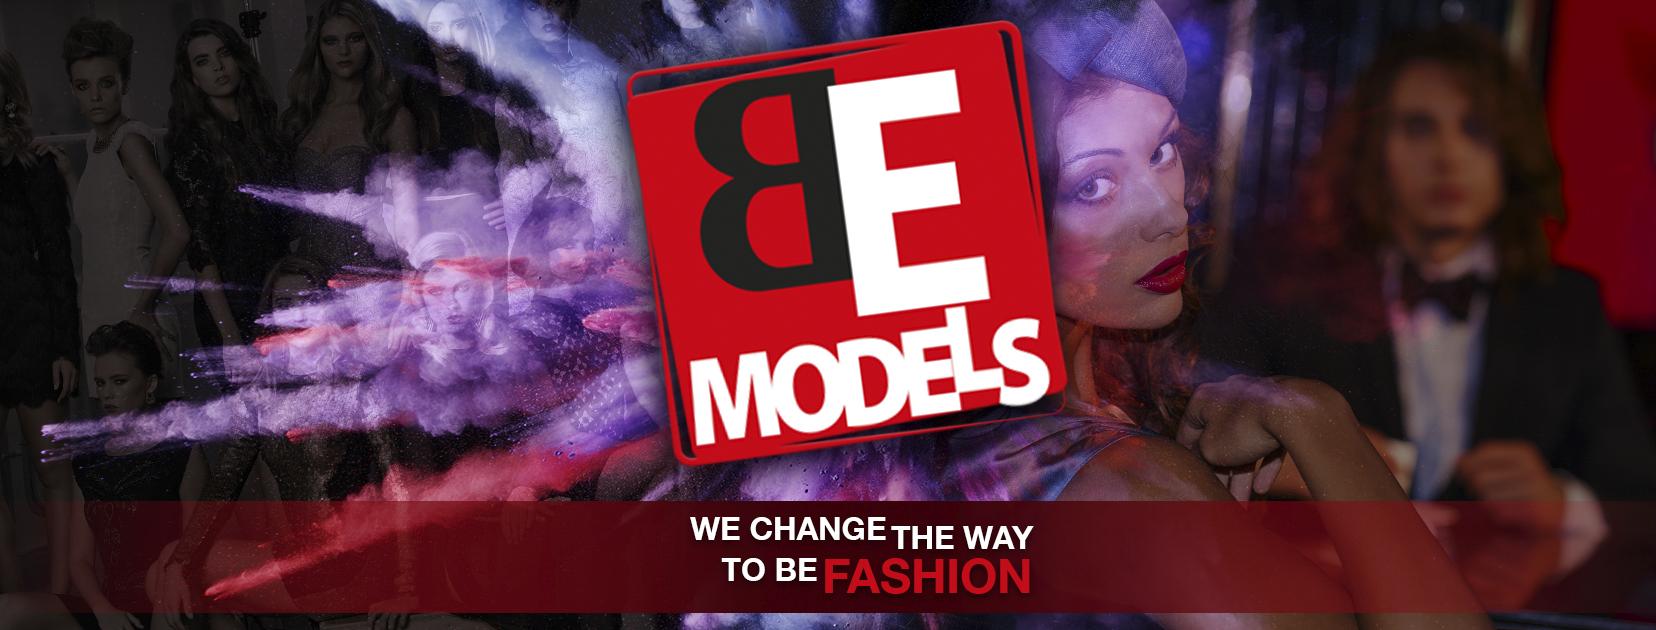 agenzia casting moda bemodels-models-management-hostess-steward-promoter-concorso-bellezza-moda-casting